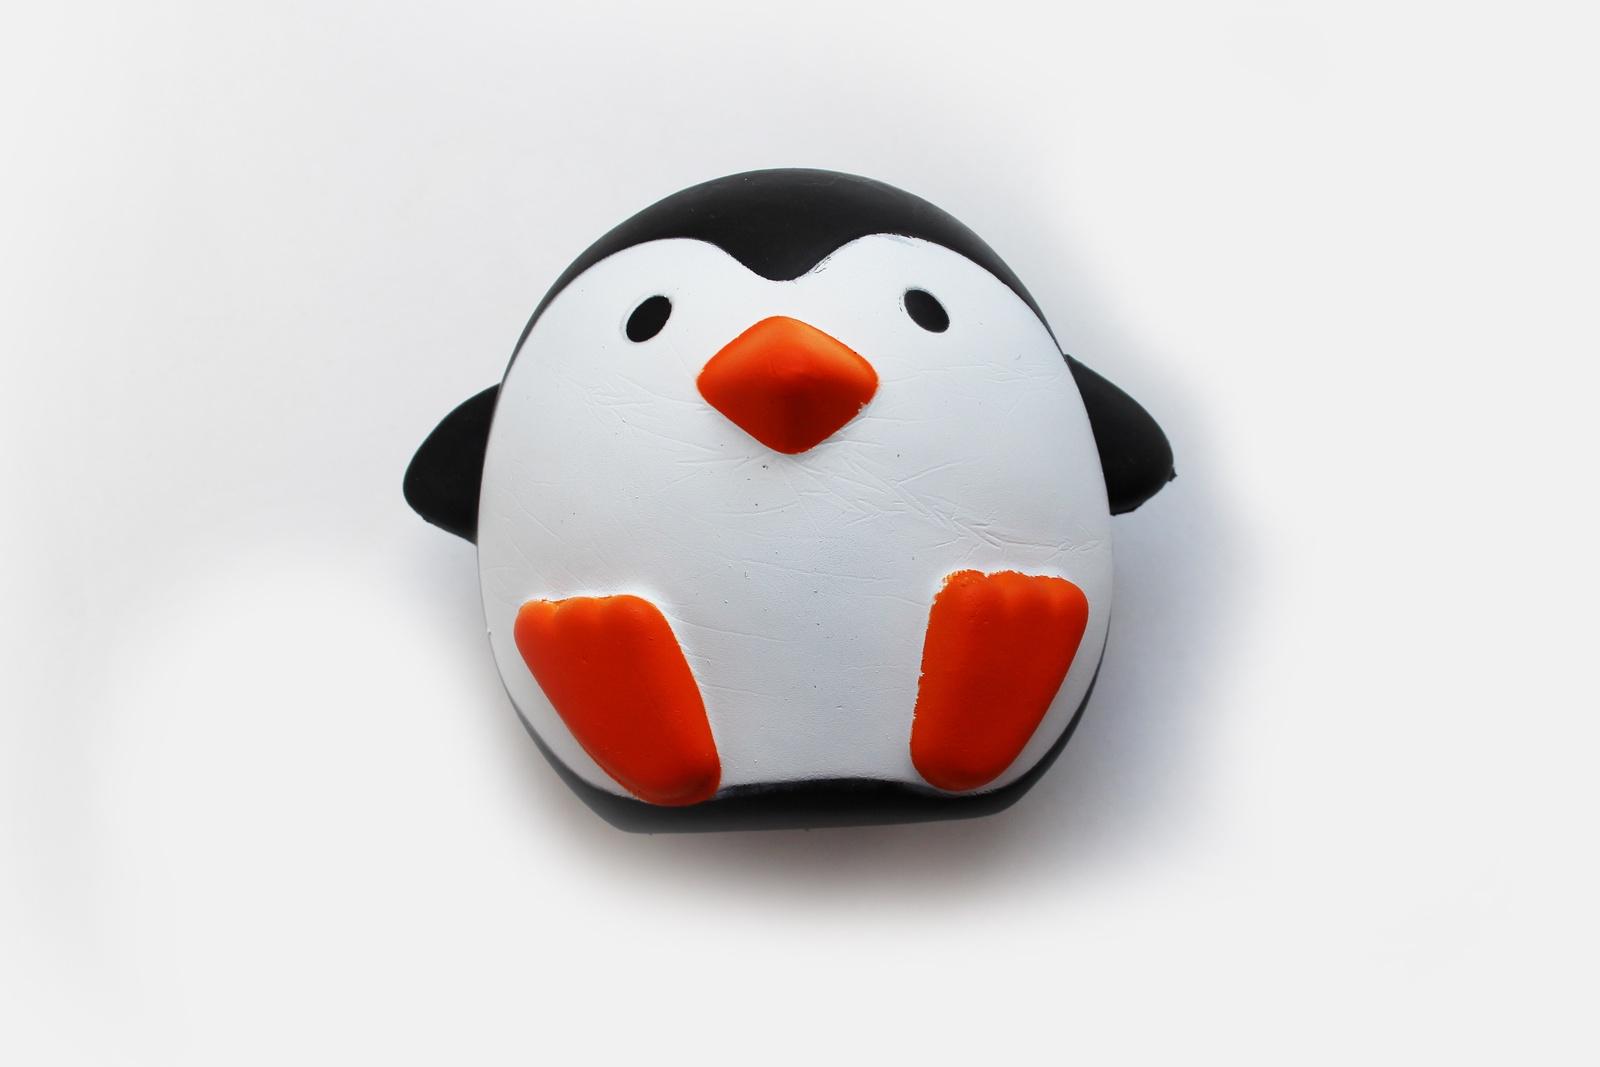 Игрушка антистресс ТОТЕМ Squishy милый пингвин белый, черный, желтый